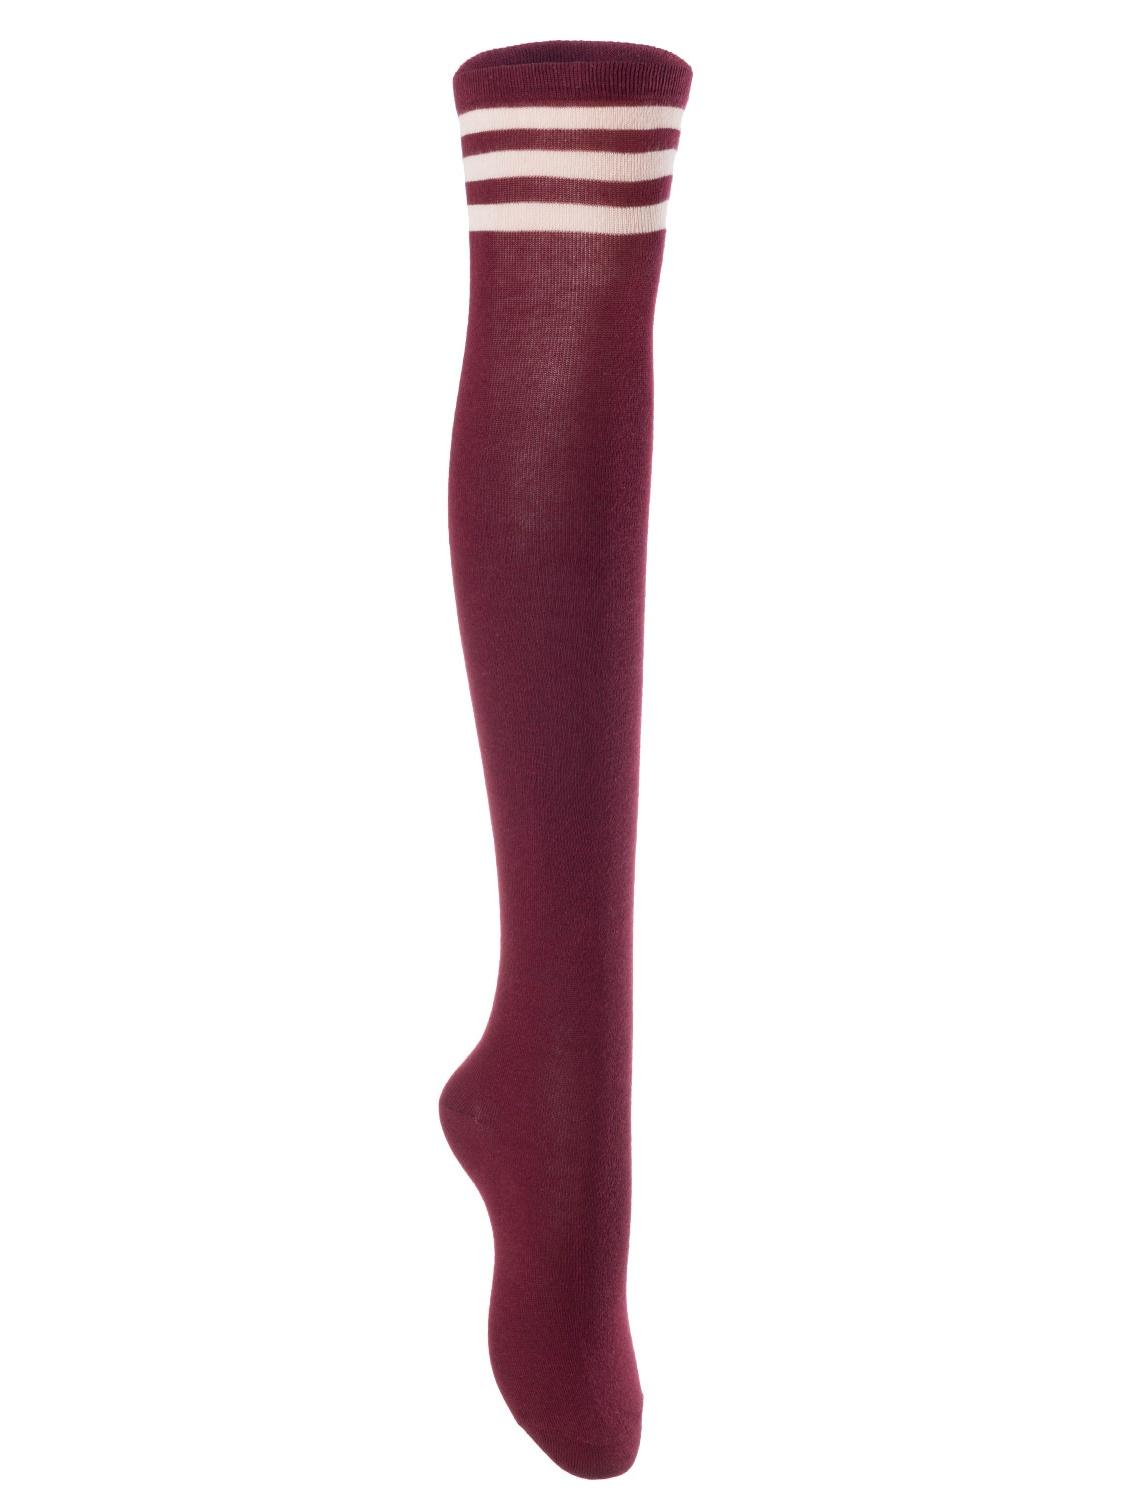 Big Girls' Women's 4 Pairs Over Knee High Thigh High Cotton Socks Leg Wamers Size L/XL(Wine) 4p1c7